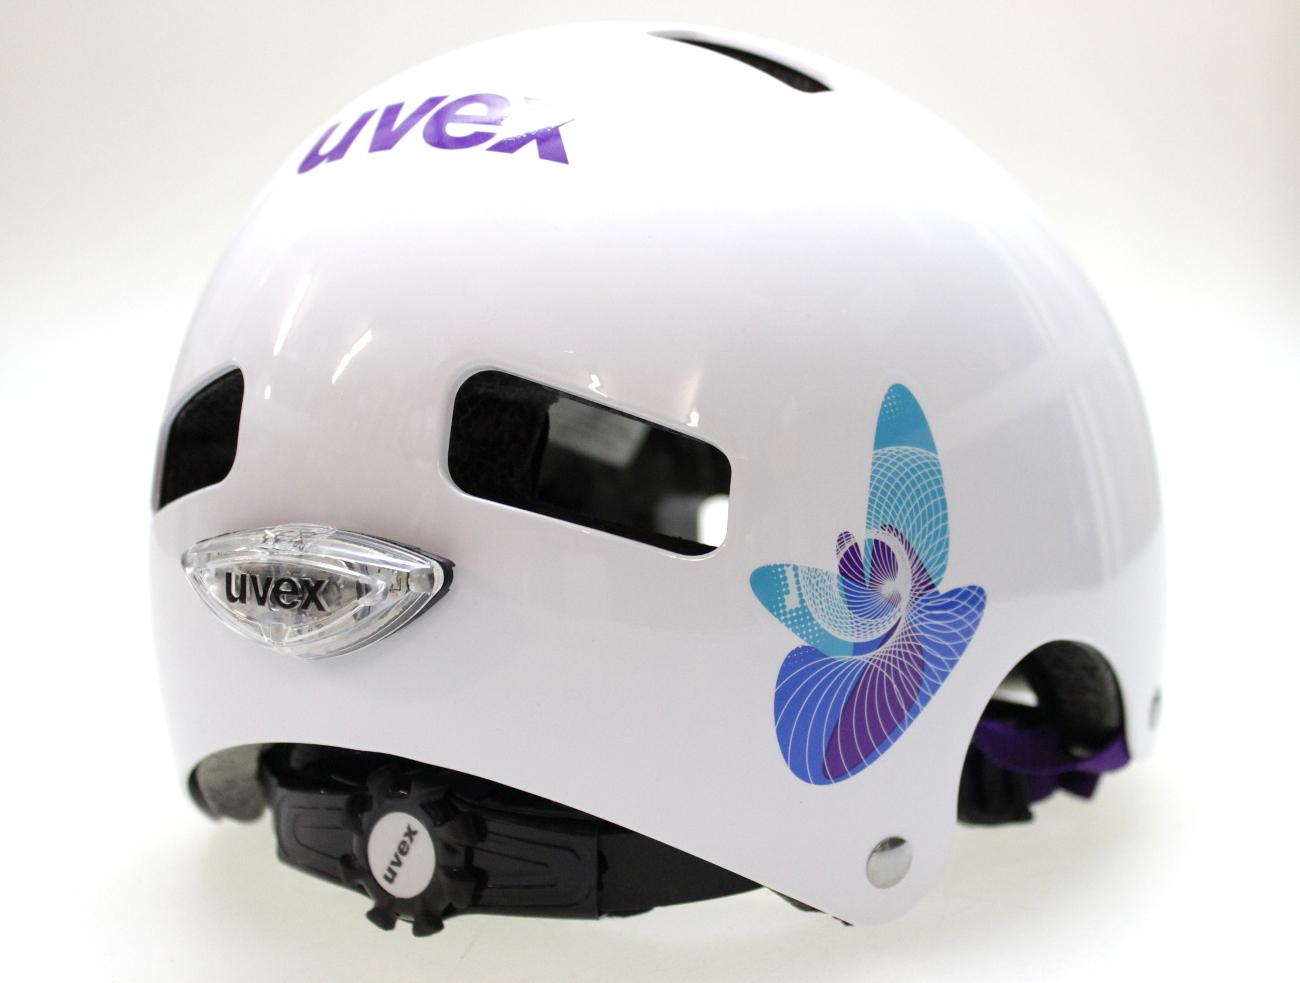 uvex kid 3 led taillight butterfly blue children 39 s bike helmet school ebay. Black Bedroom Furniture Sets. Home Design Ideas